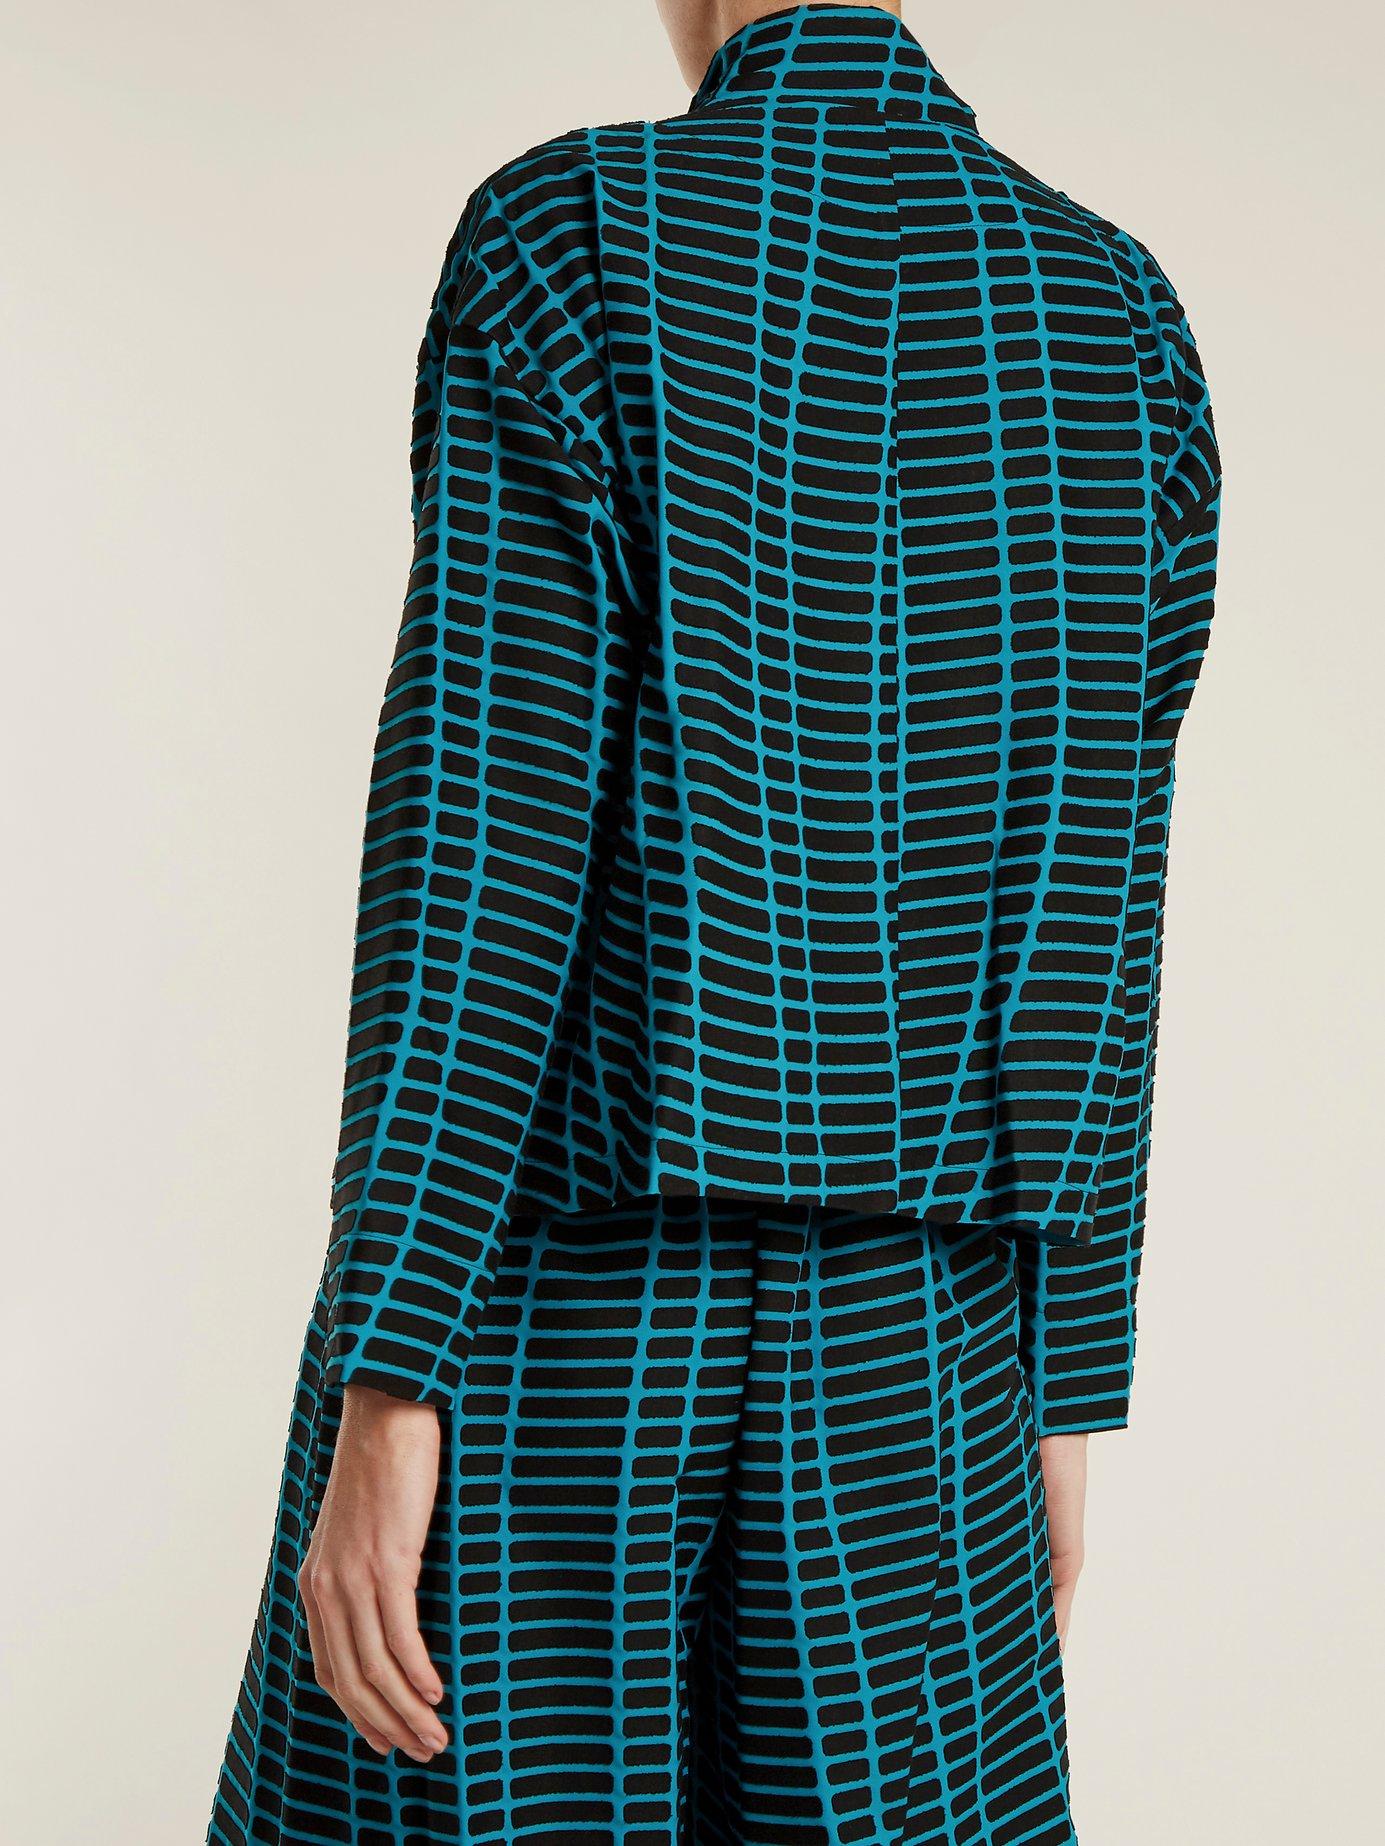 Skew drop-shoulder graphic-embellished jacket by Issey Miyake